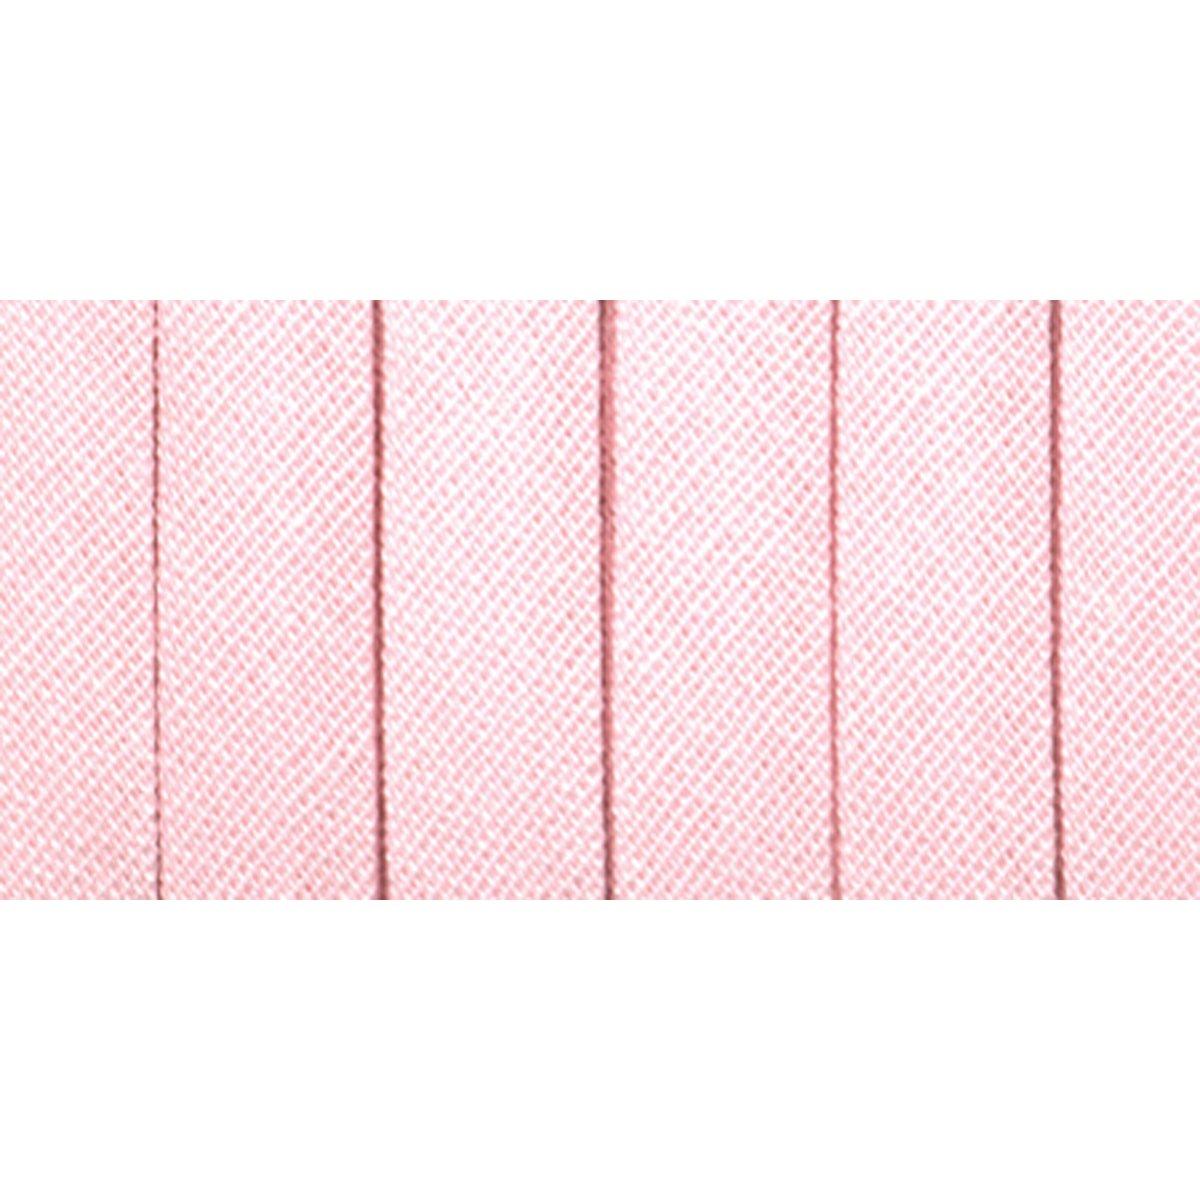 Wrights 117-201-076 Double Fold Bias Tape 4-Yard Scarlet